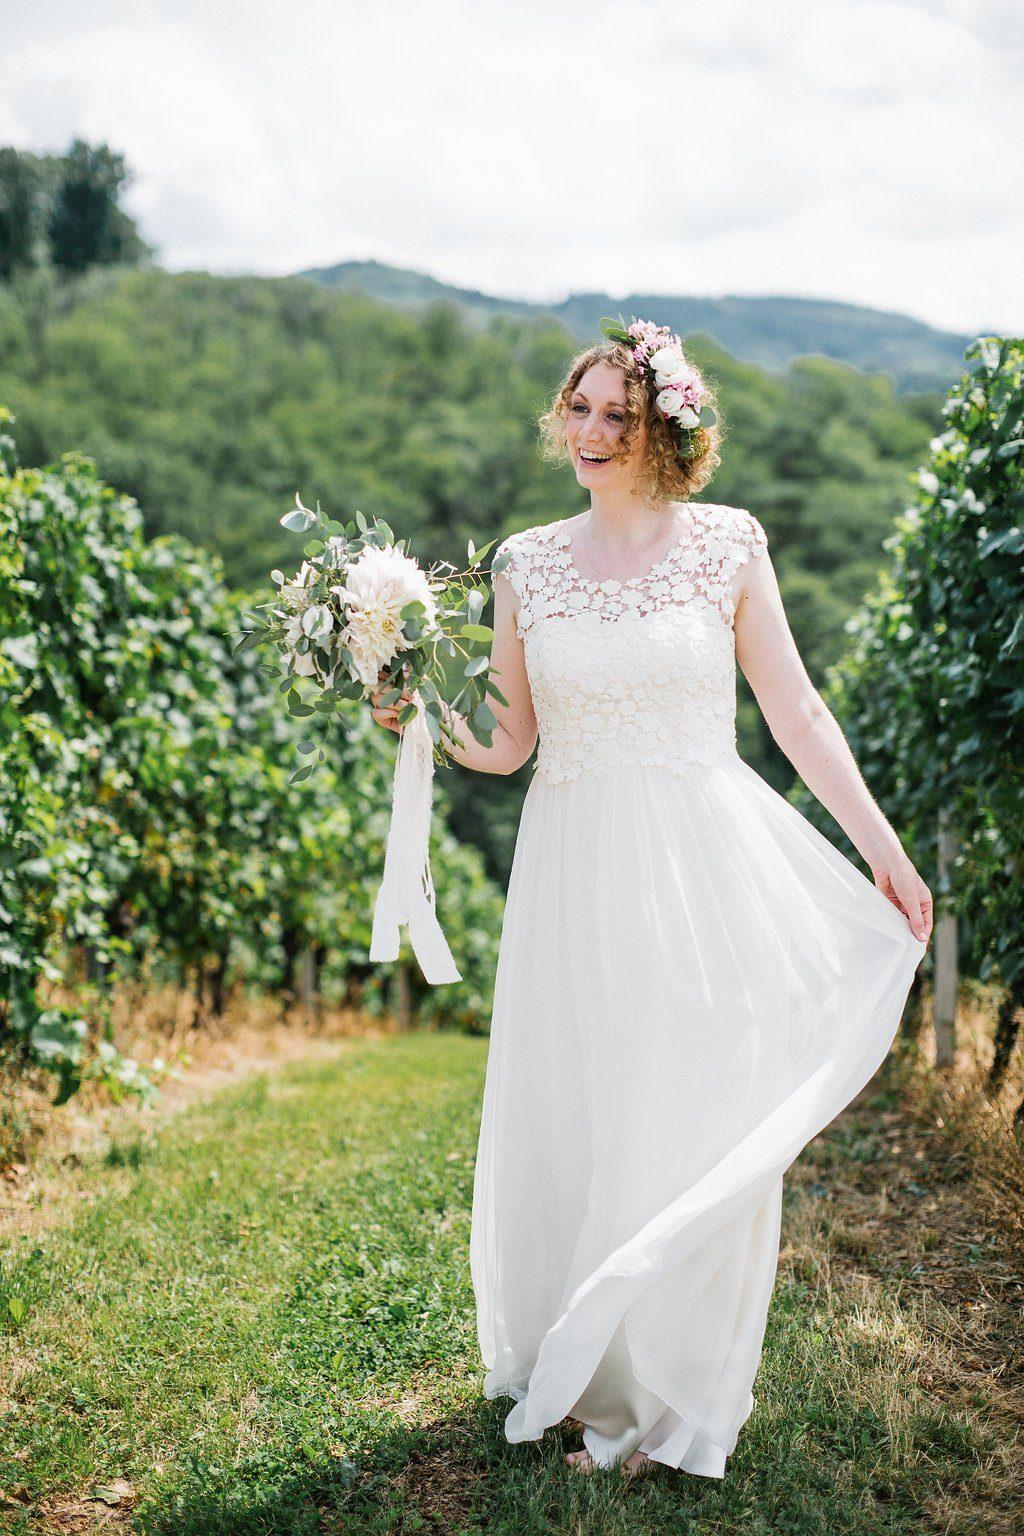 Kisui Brautkleid mit Spitze